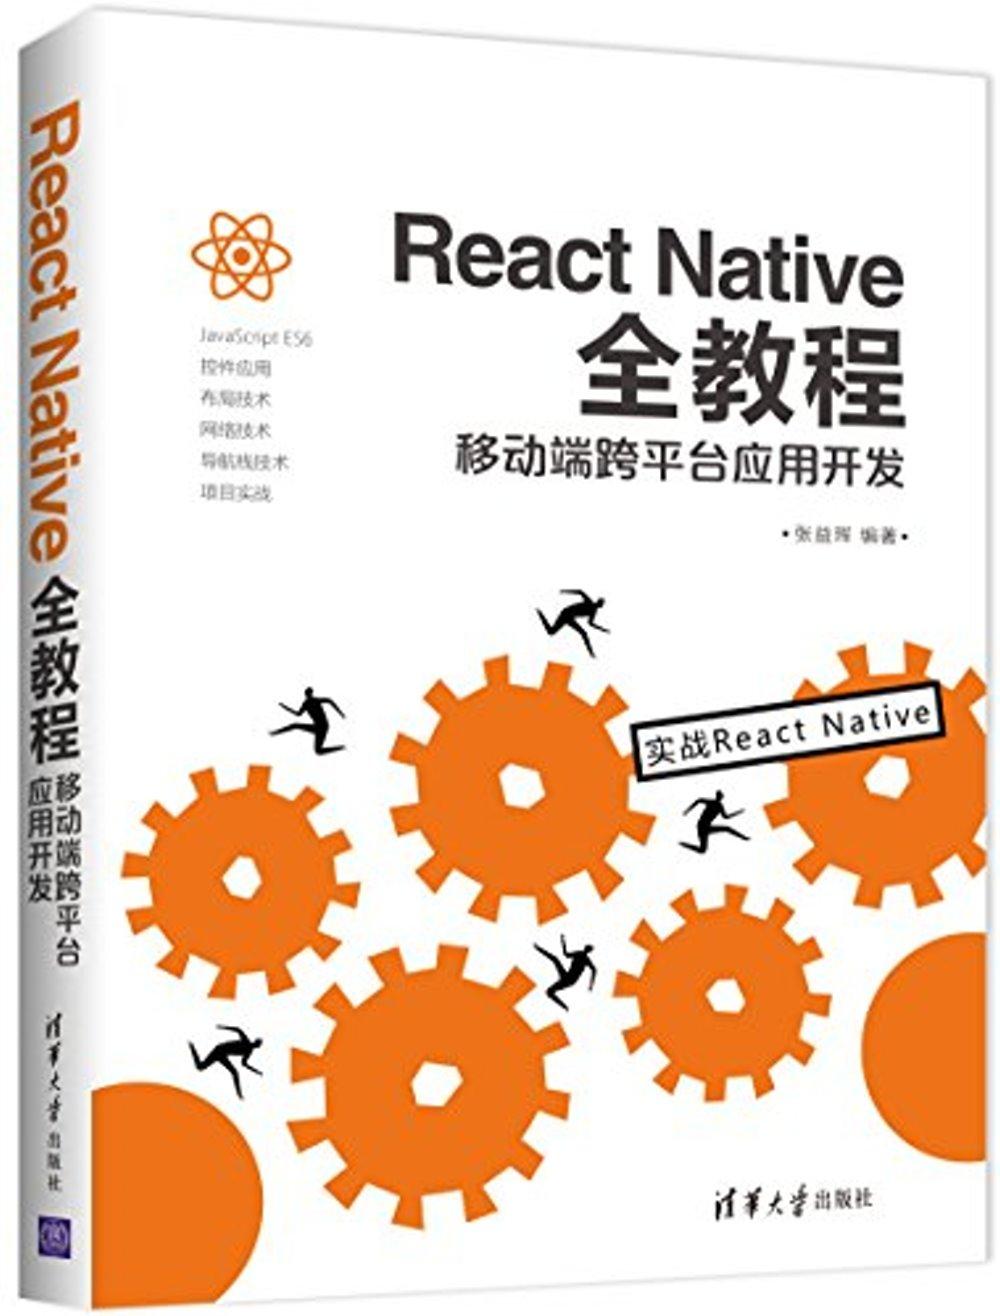 React Native全教程:移動端跨平台應用開發